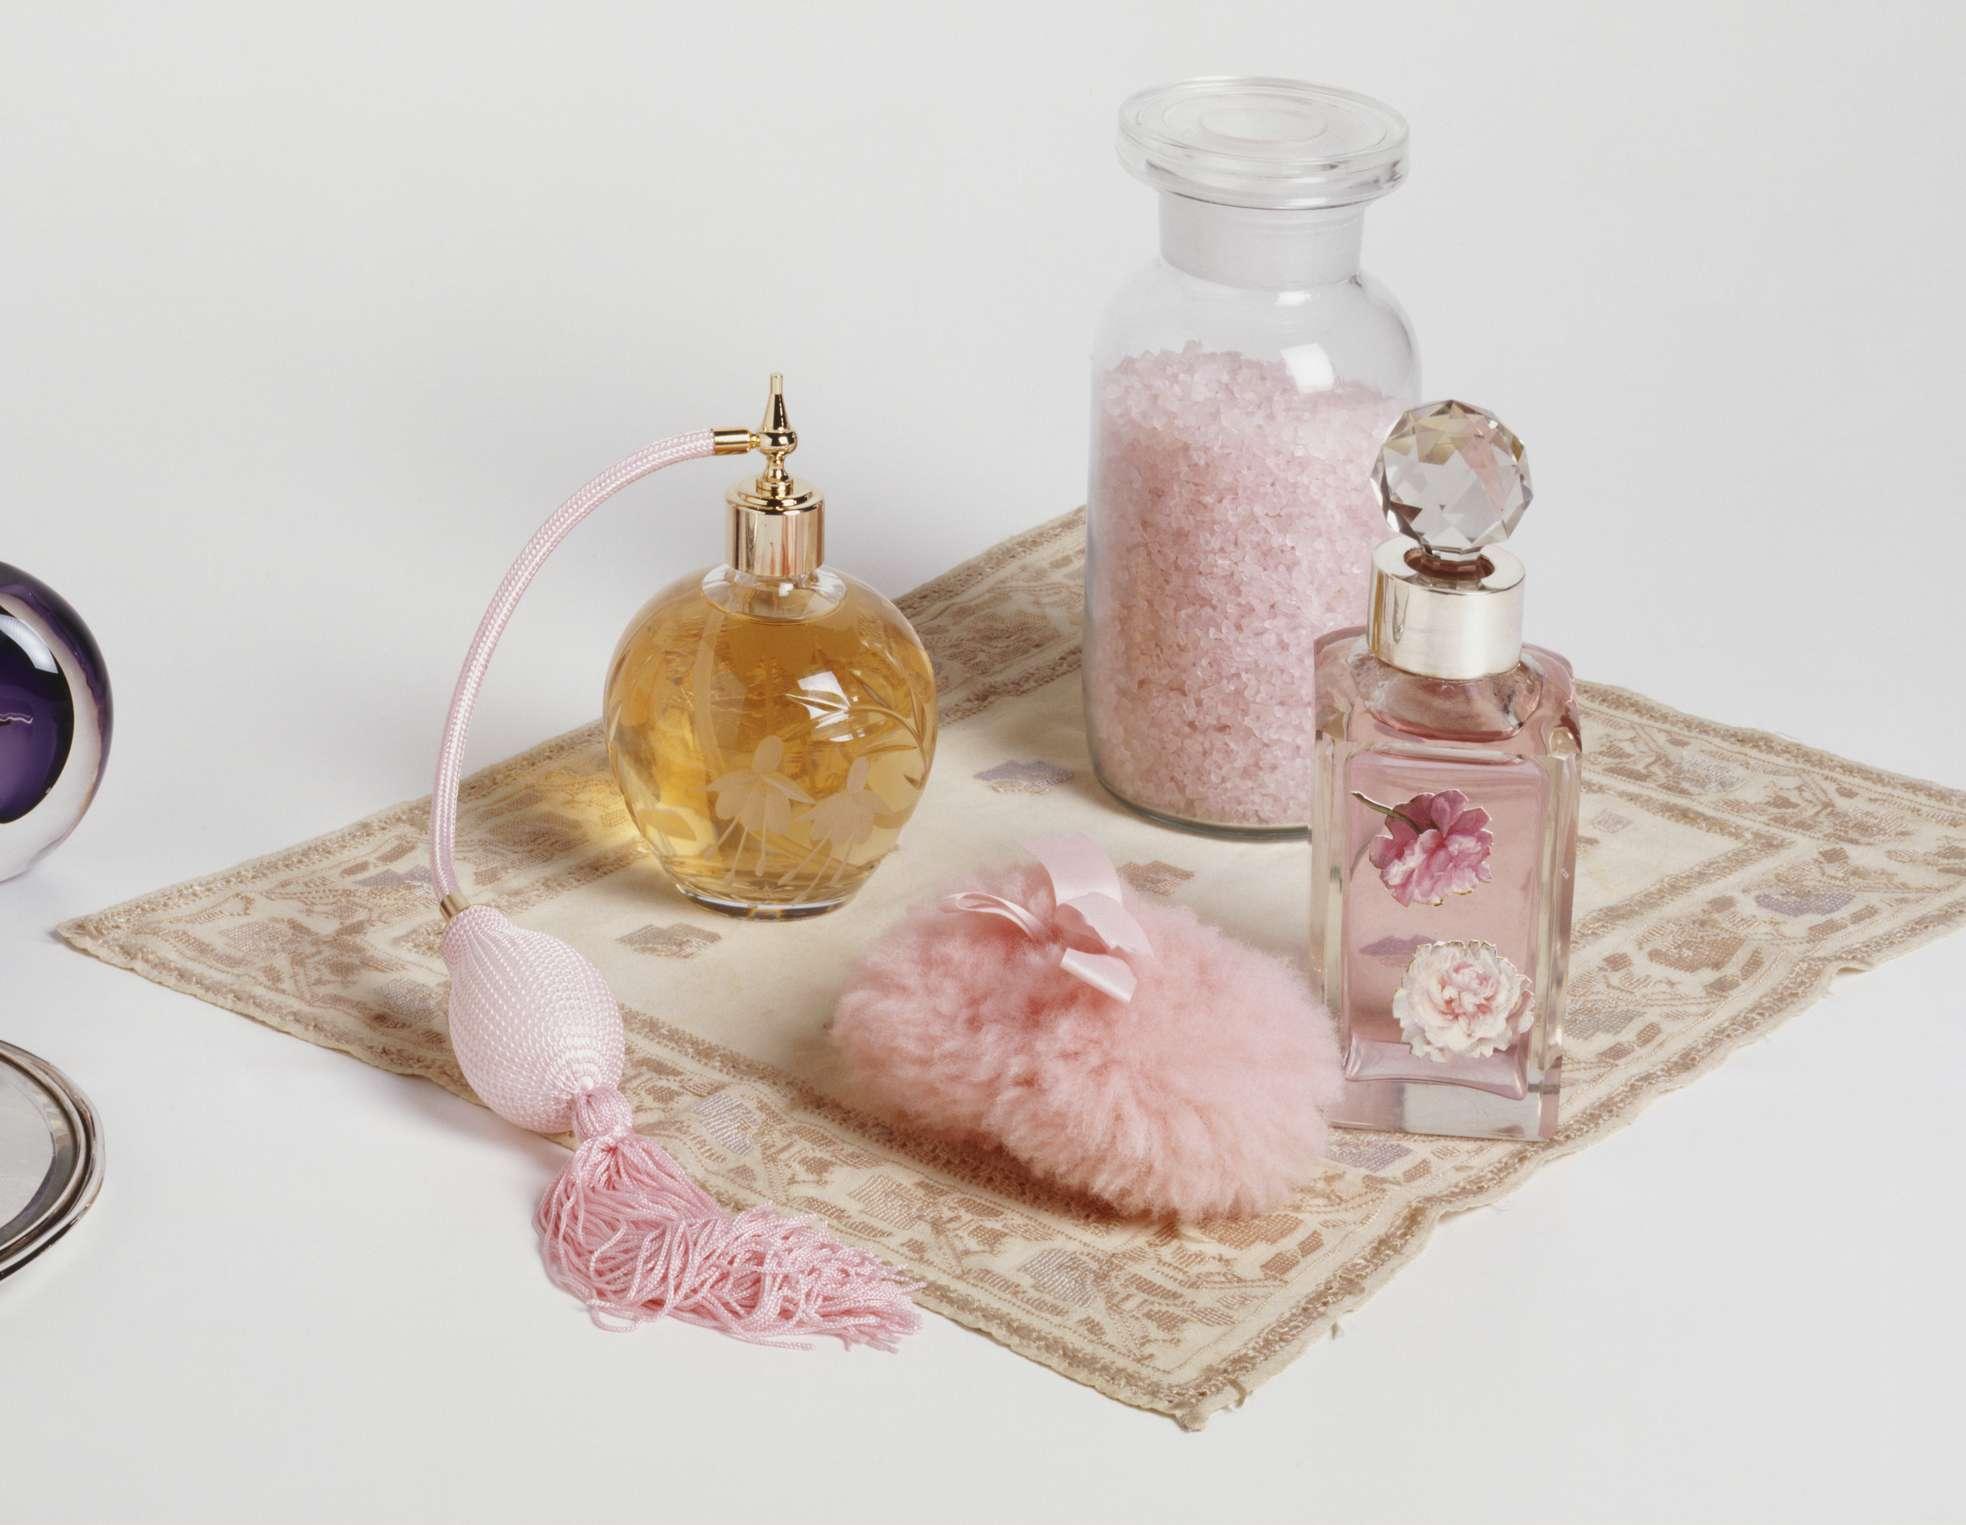 Perfume and bathsalts sit on a cloth.